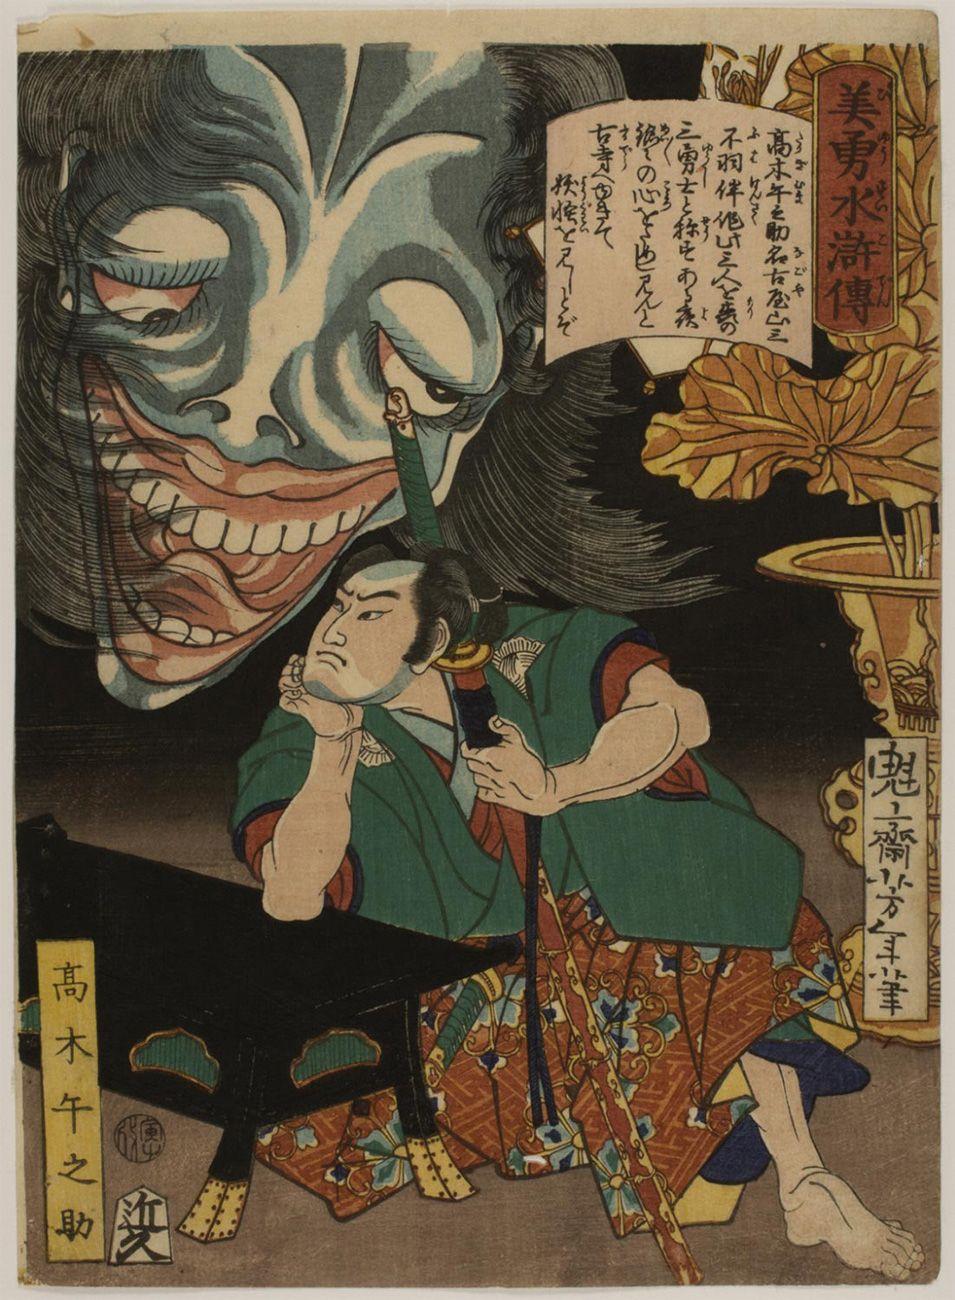 Takagi Umanosuke Kneeling by Huge Head, from the series